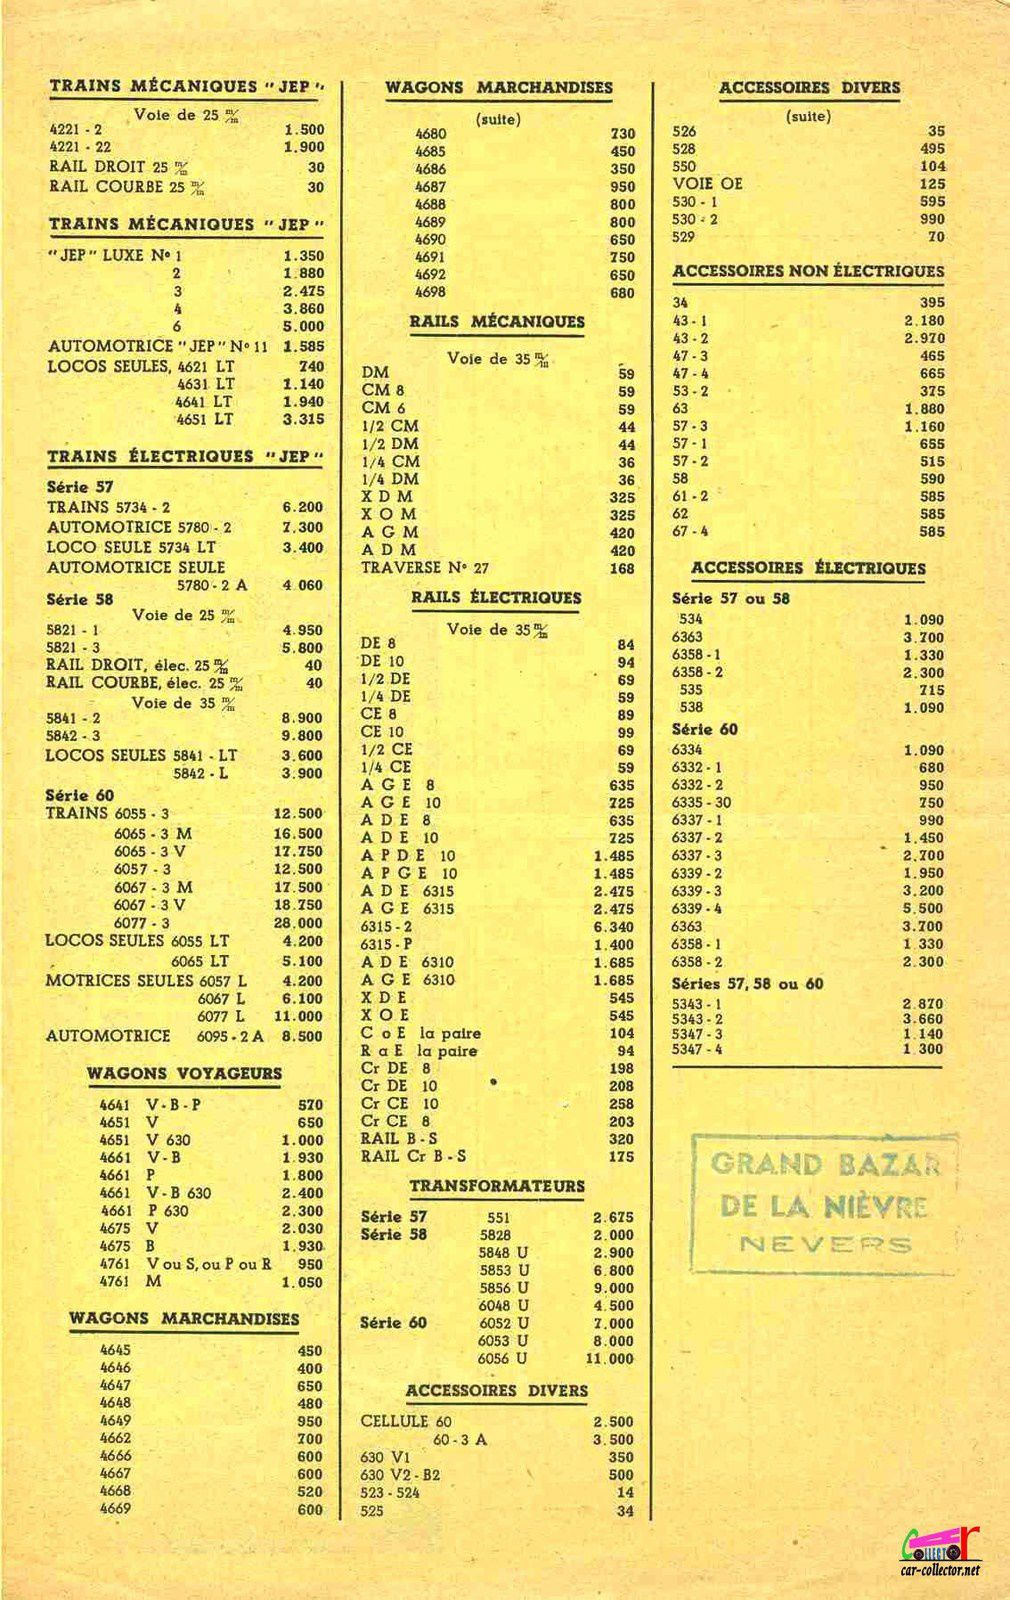 CATALOGUE TRAINS JEP 1953 - 1954